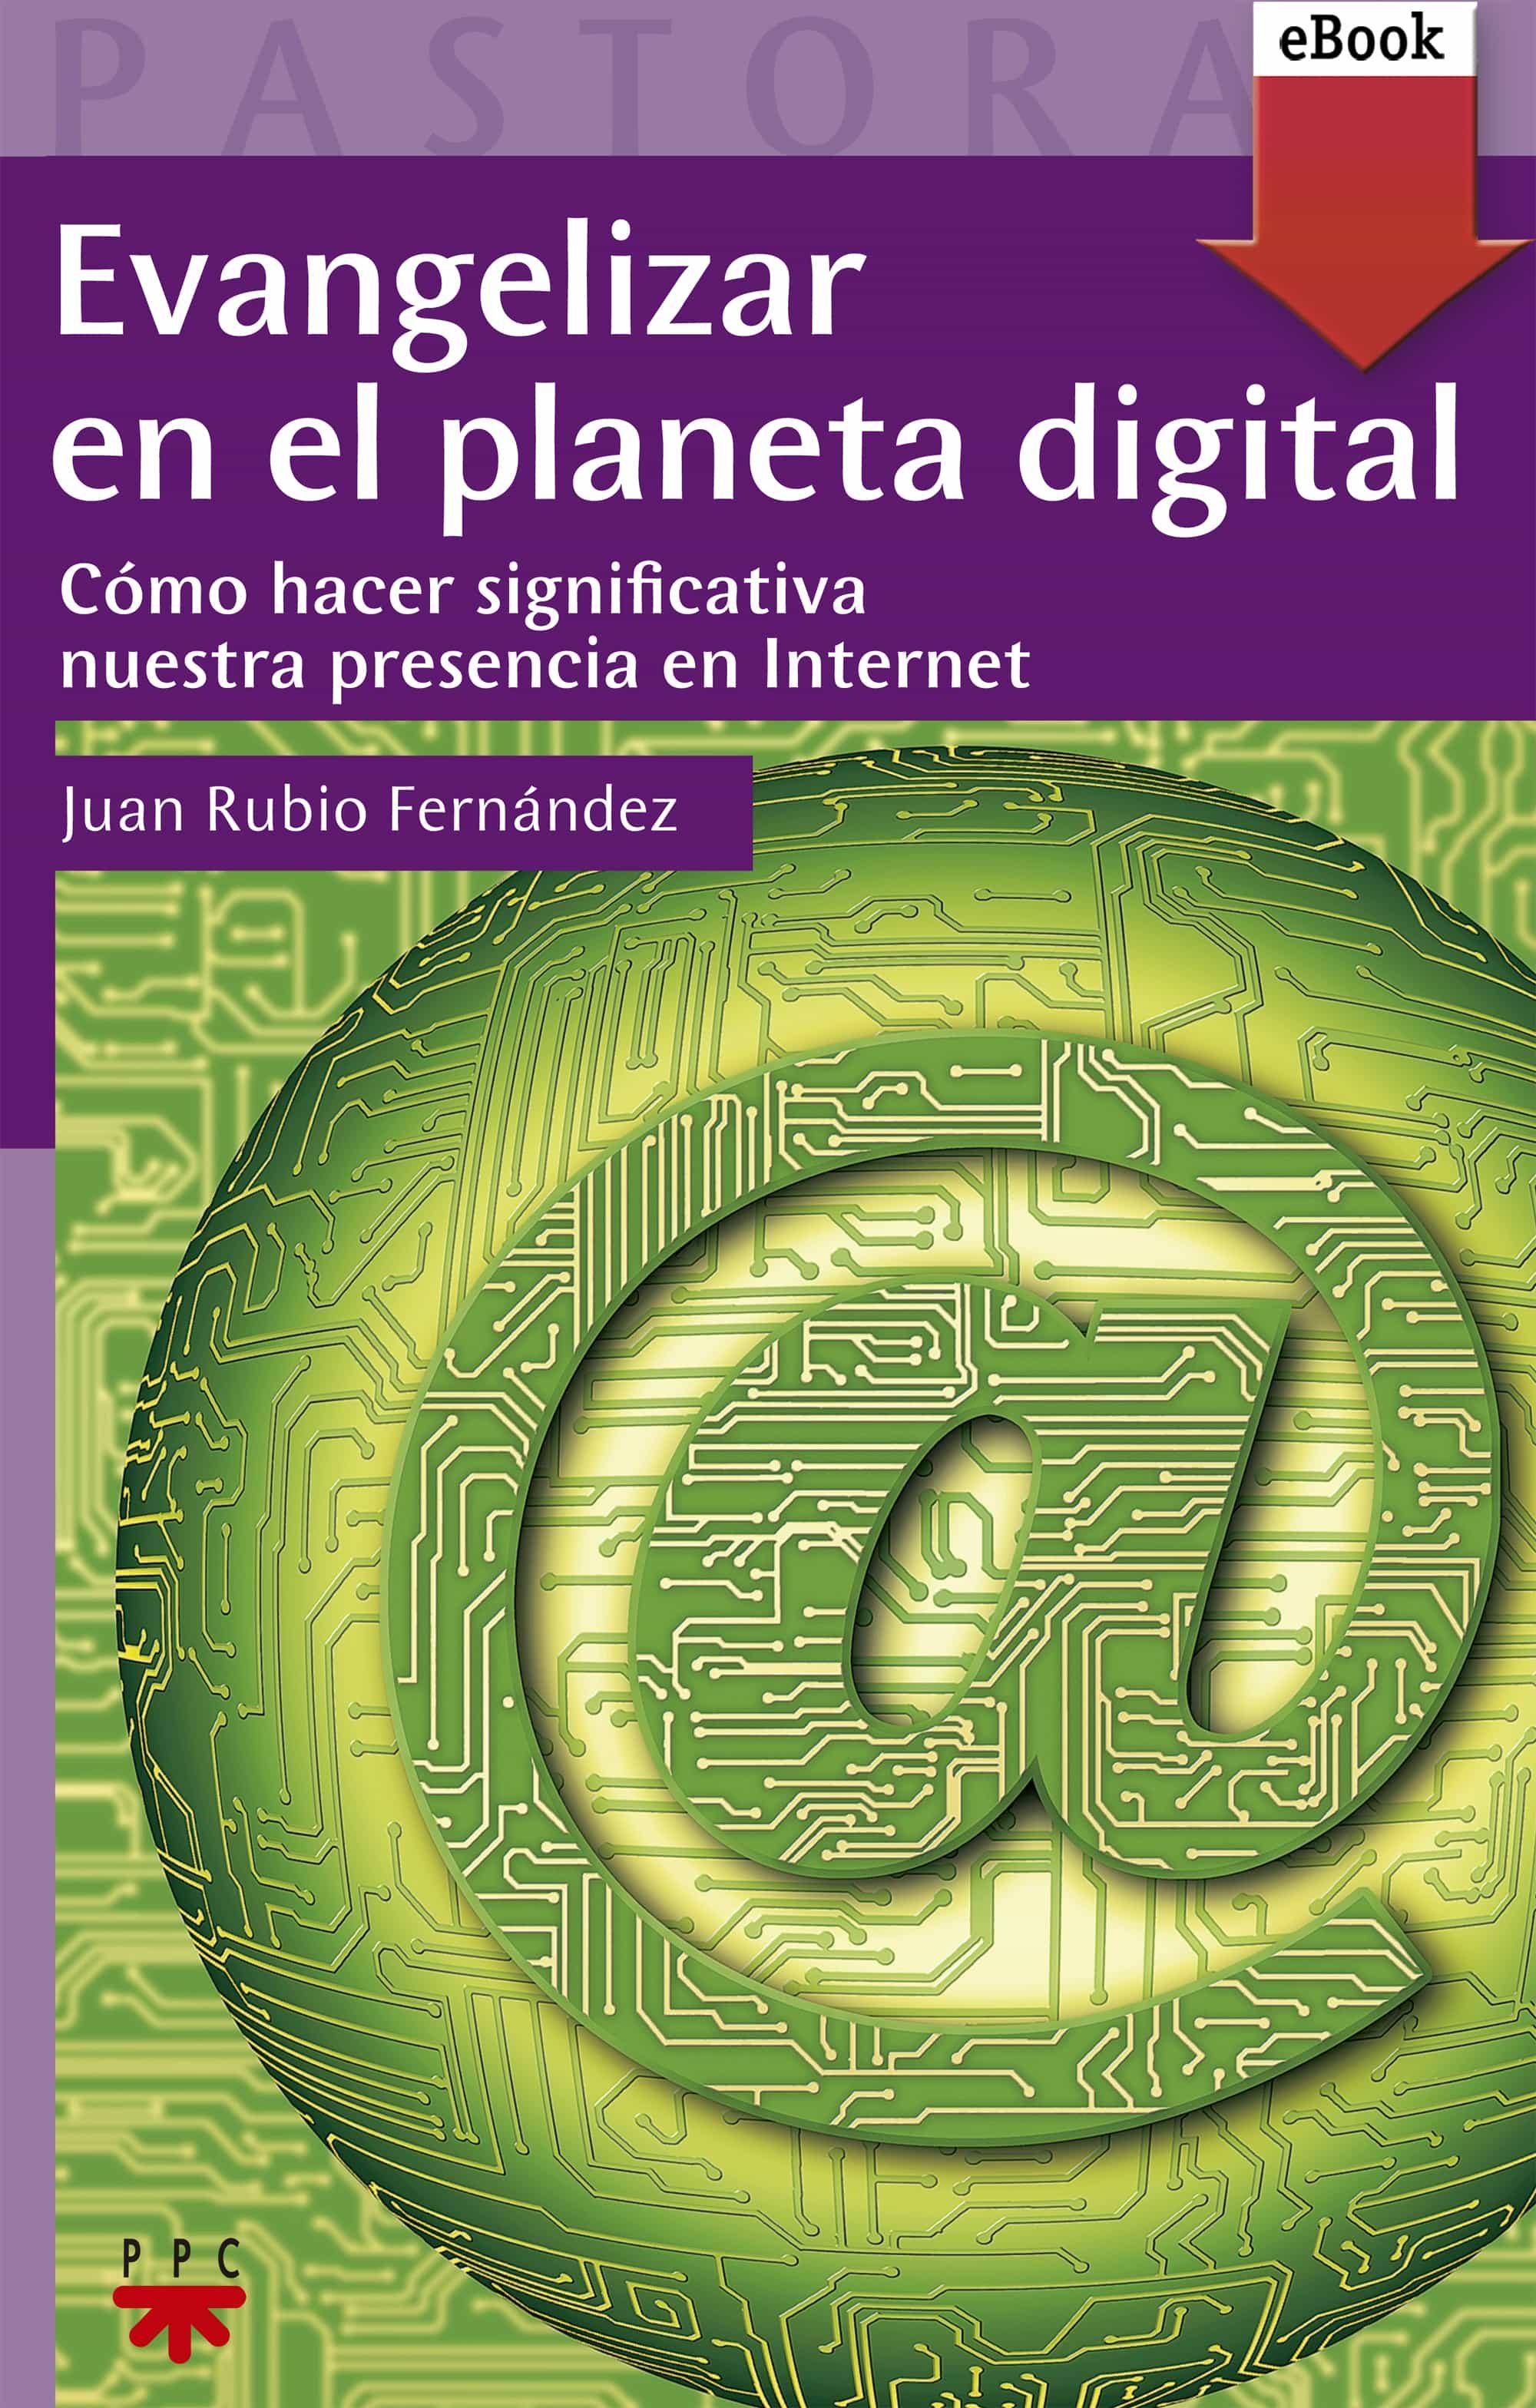 Evangelizar en el planeta digital (ebook)